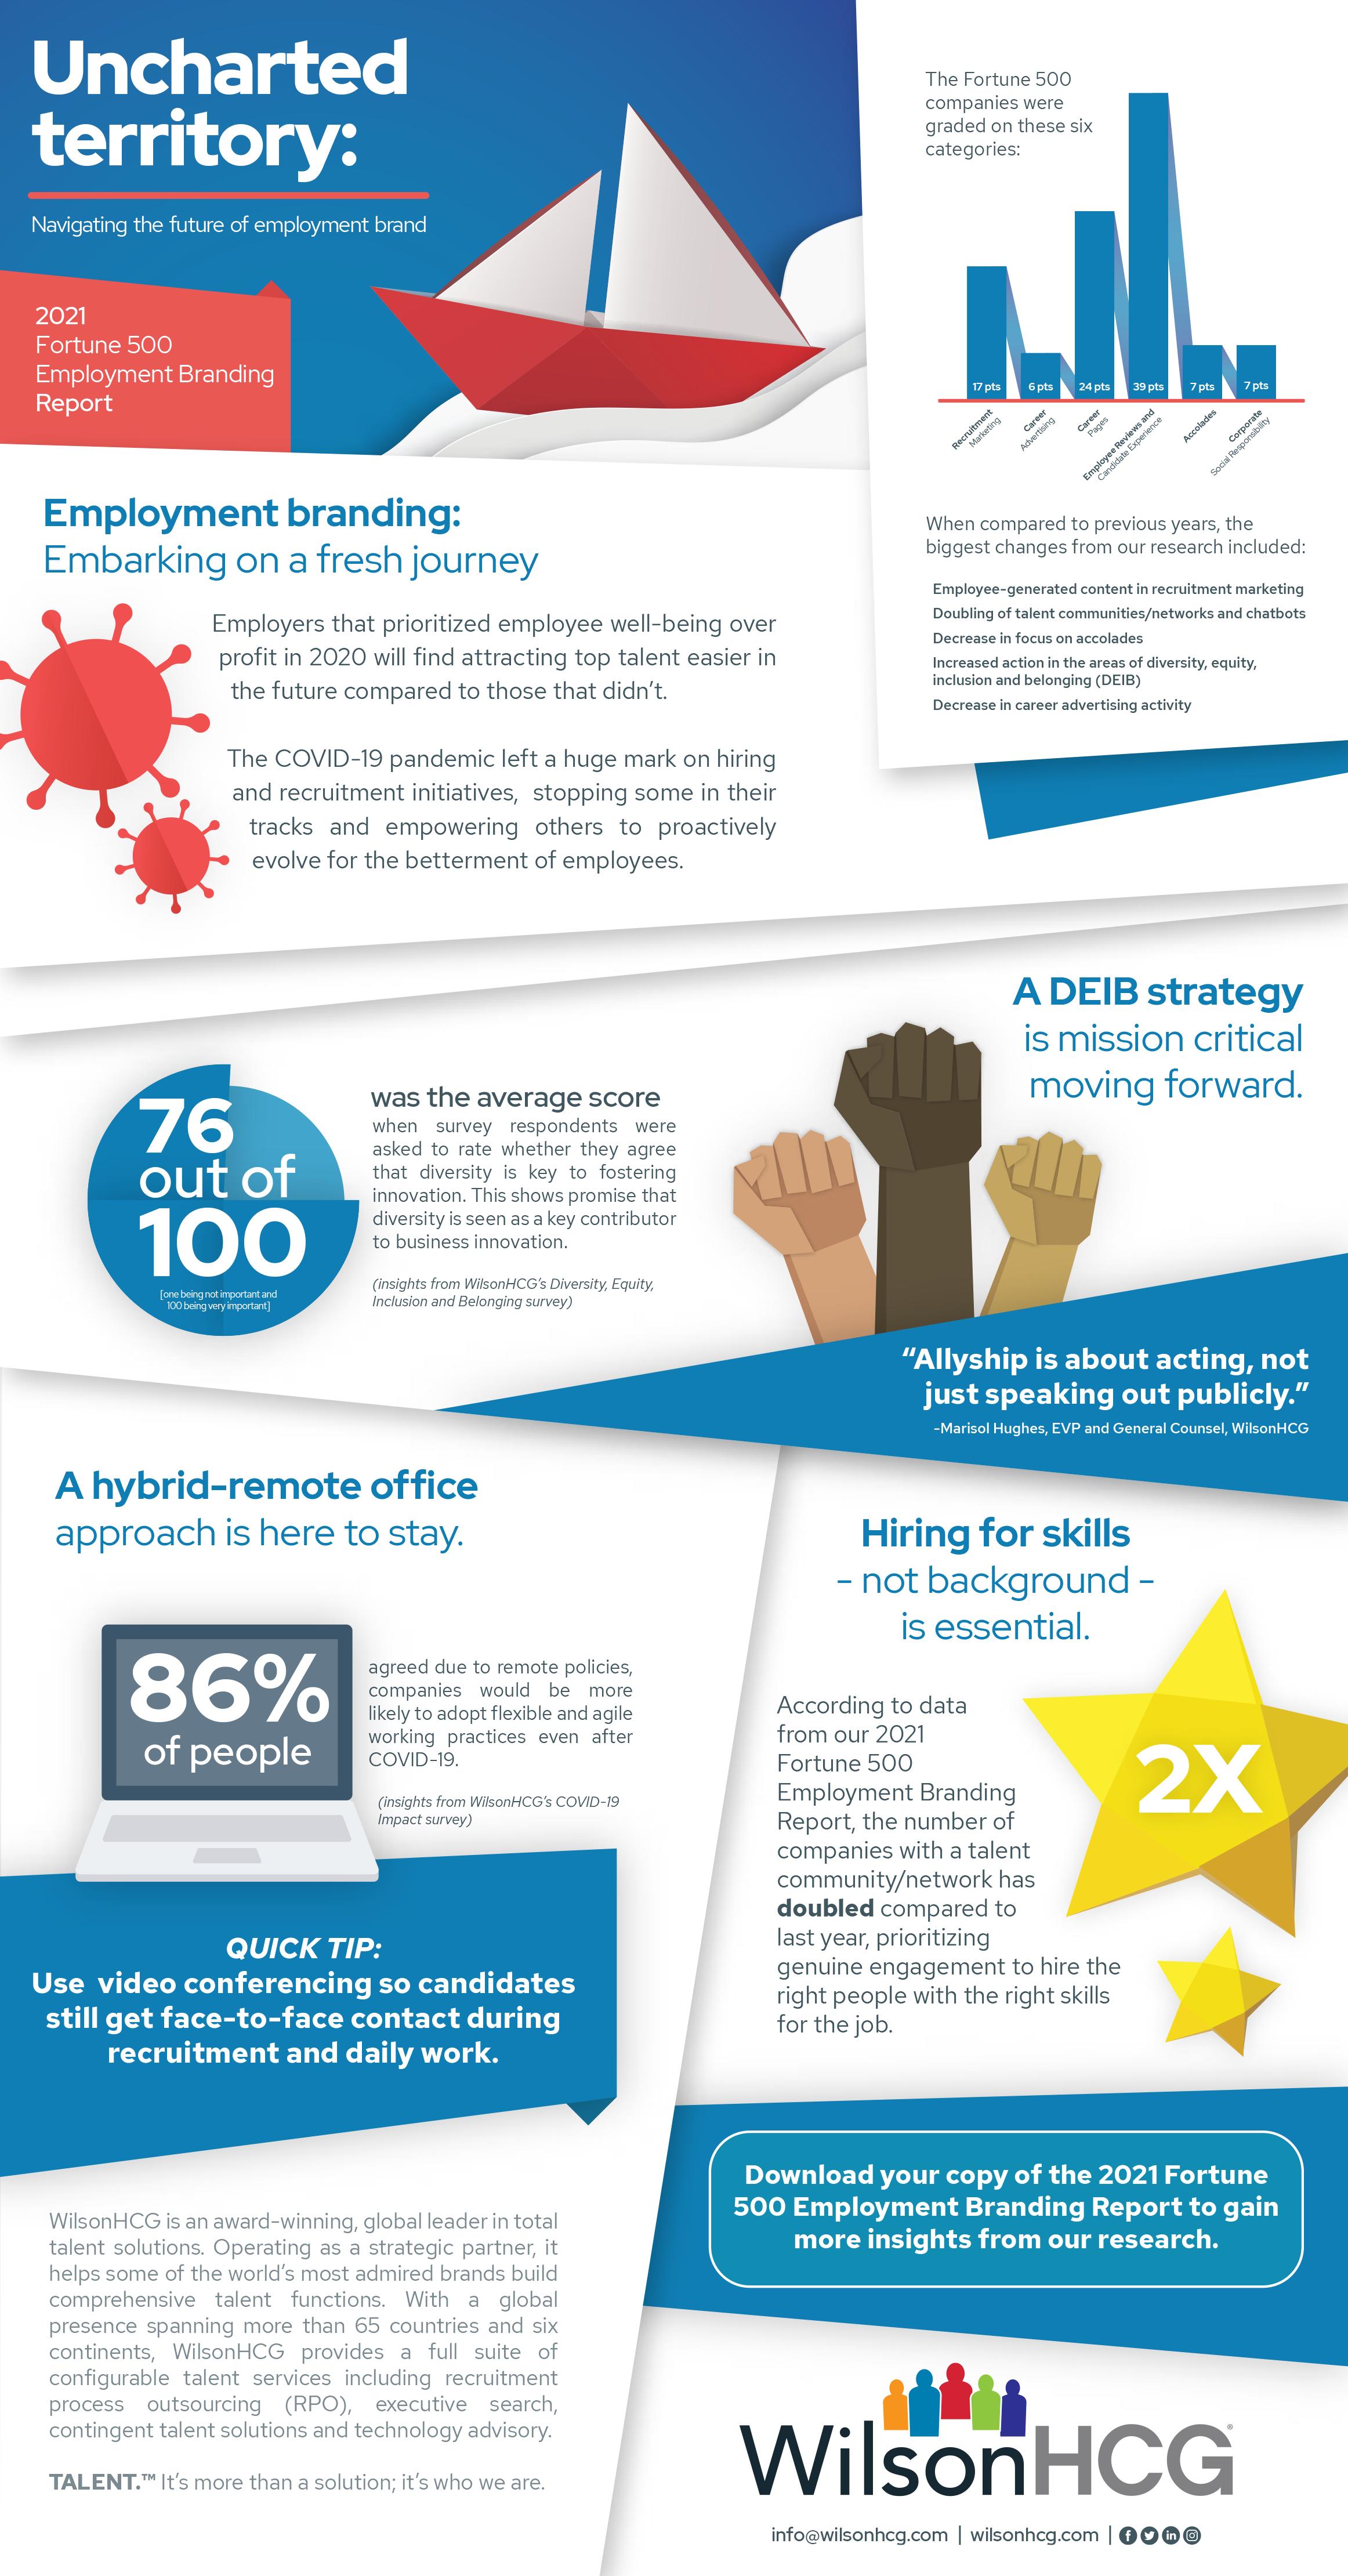 2021-WHCG-Employment-Branding-Report_infographic